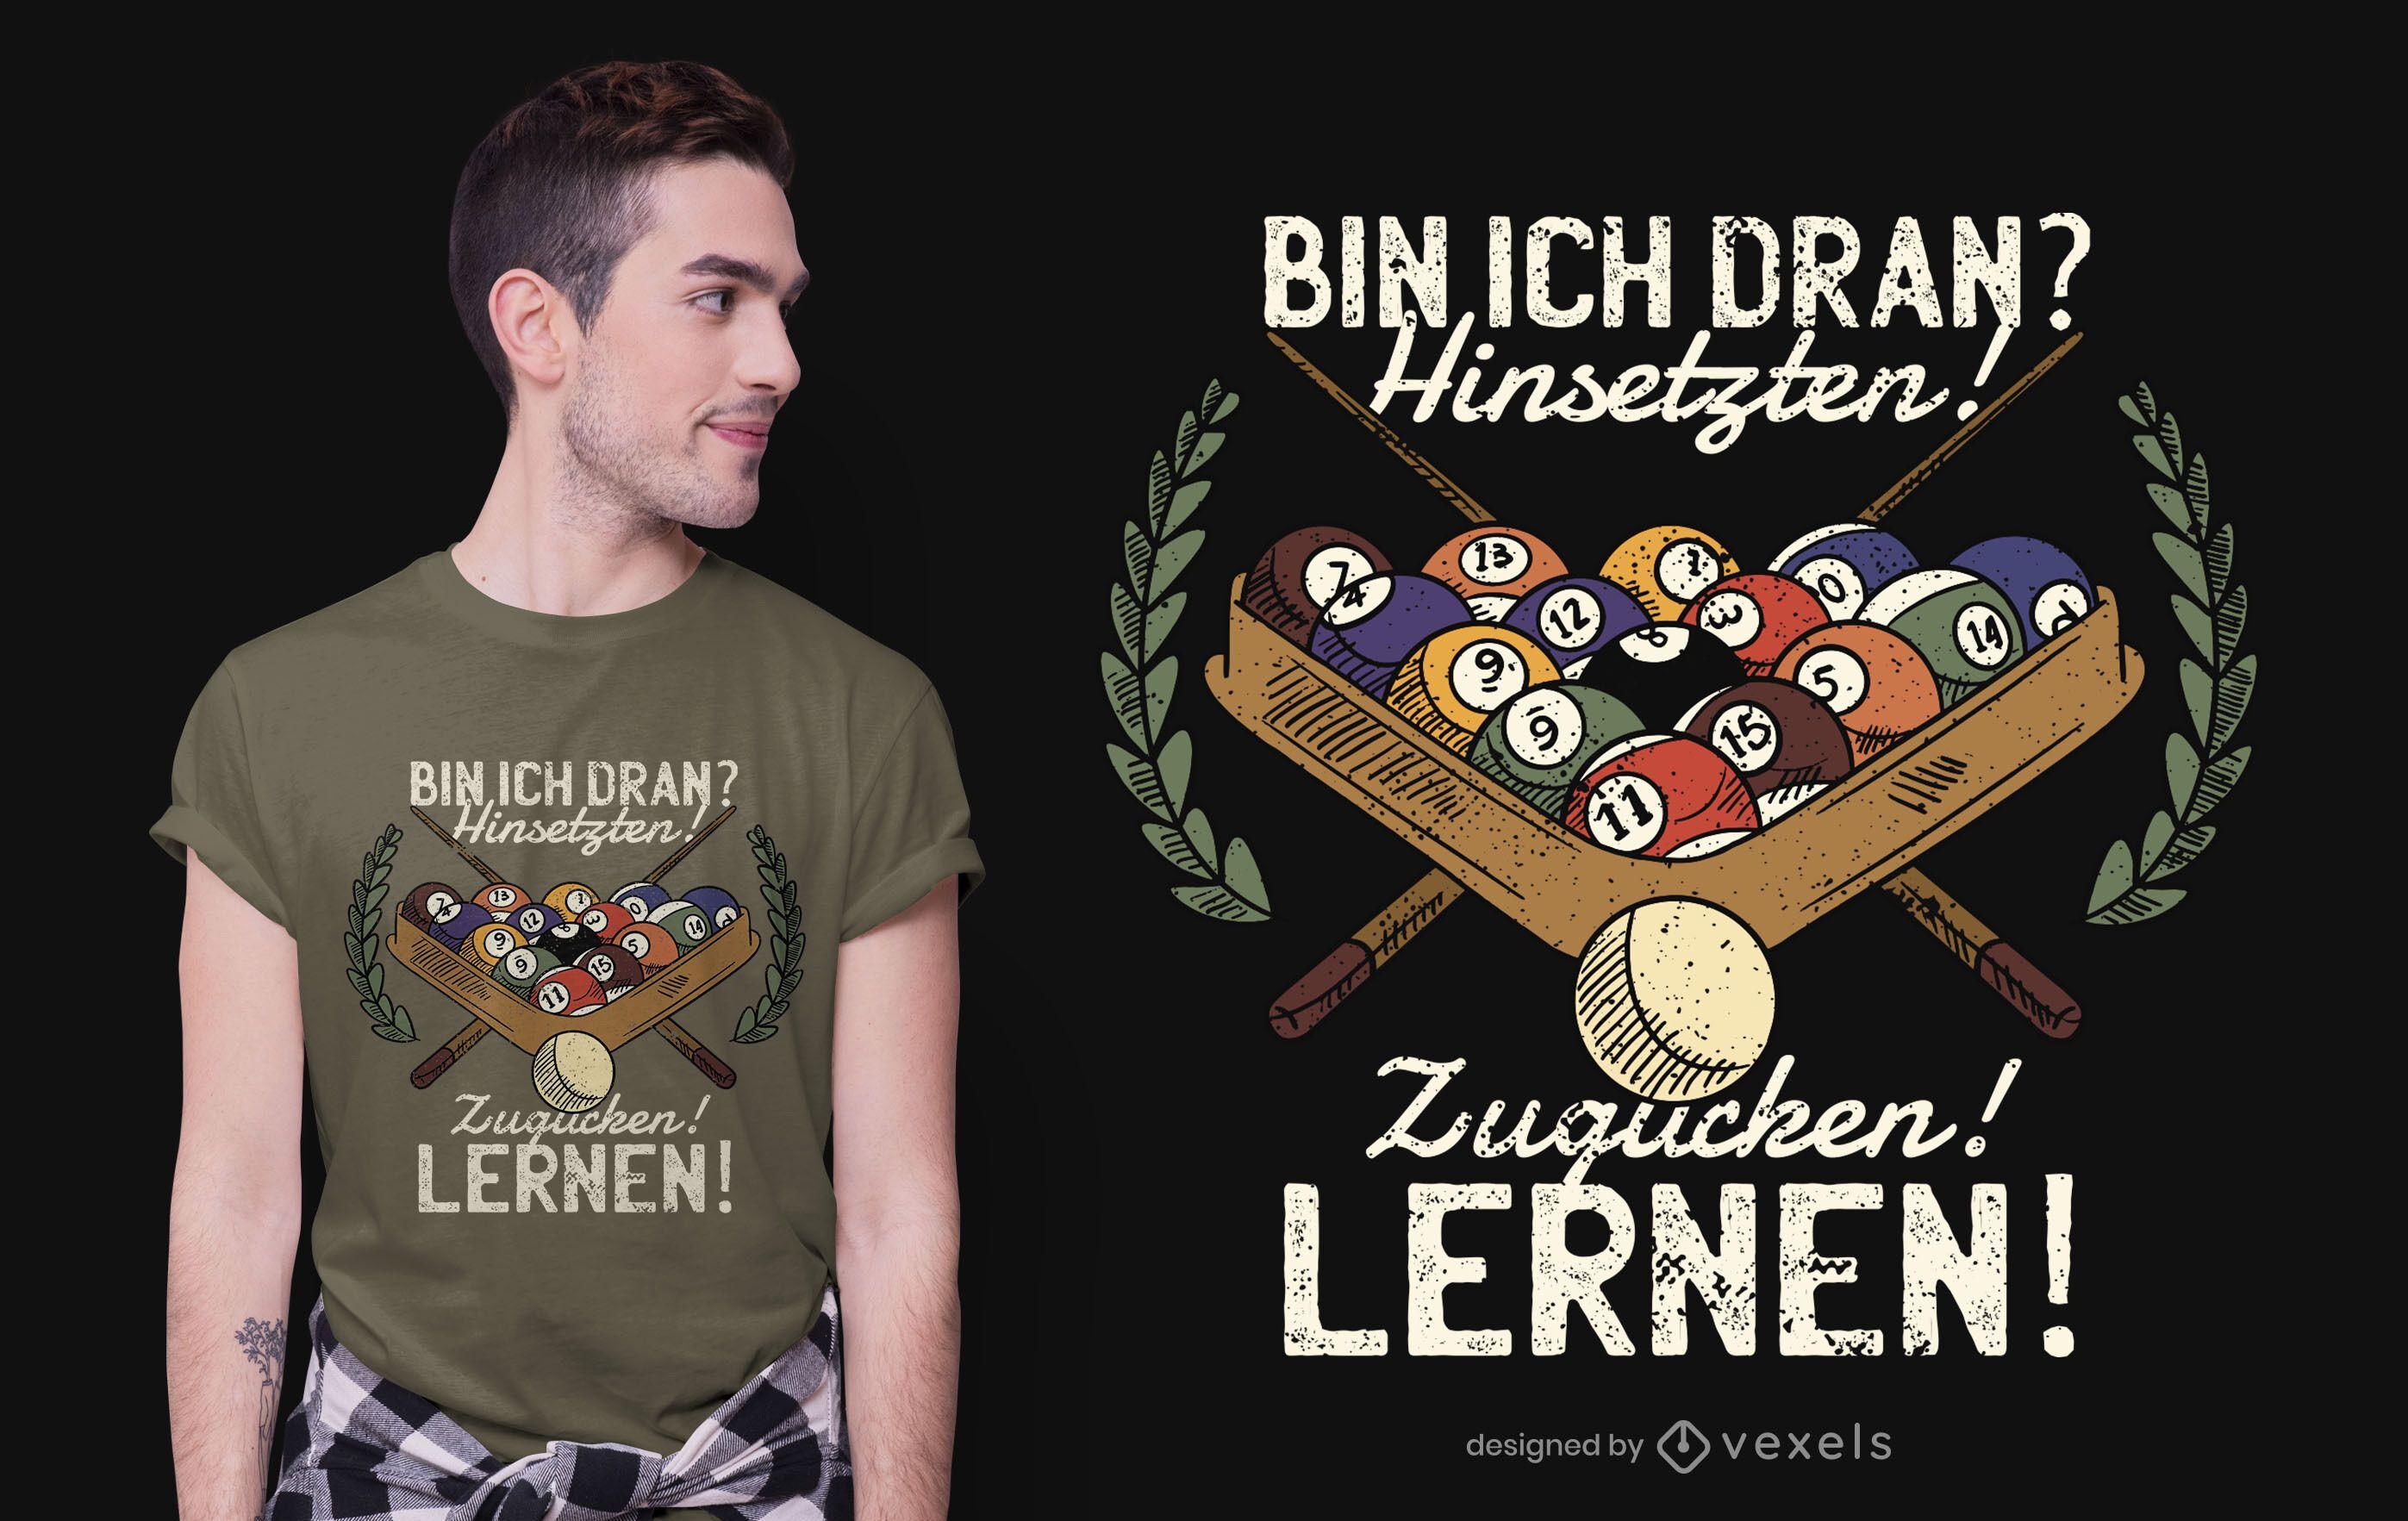 Funny German Billiard Quote T-shirt Design